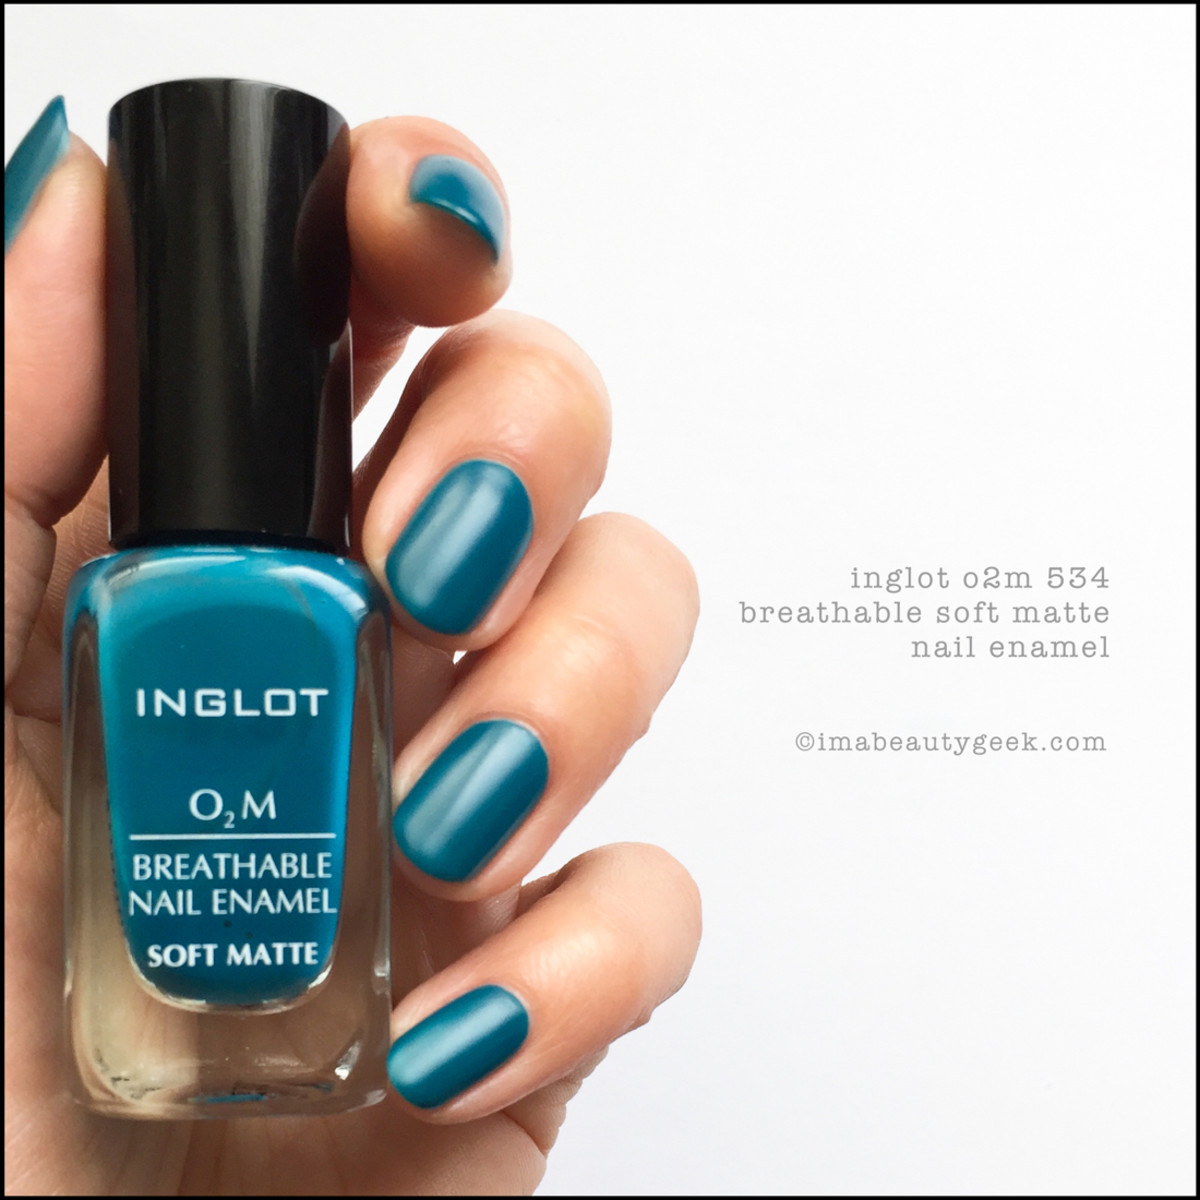 Inglot o2m 534 Breathable Nail Enamel_Inglot 534 matte nail polish